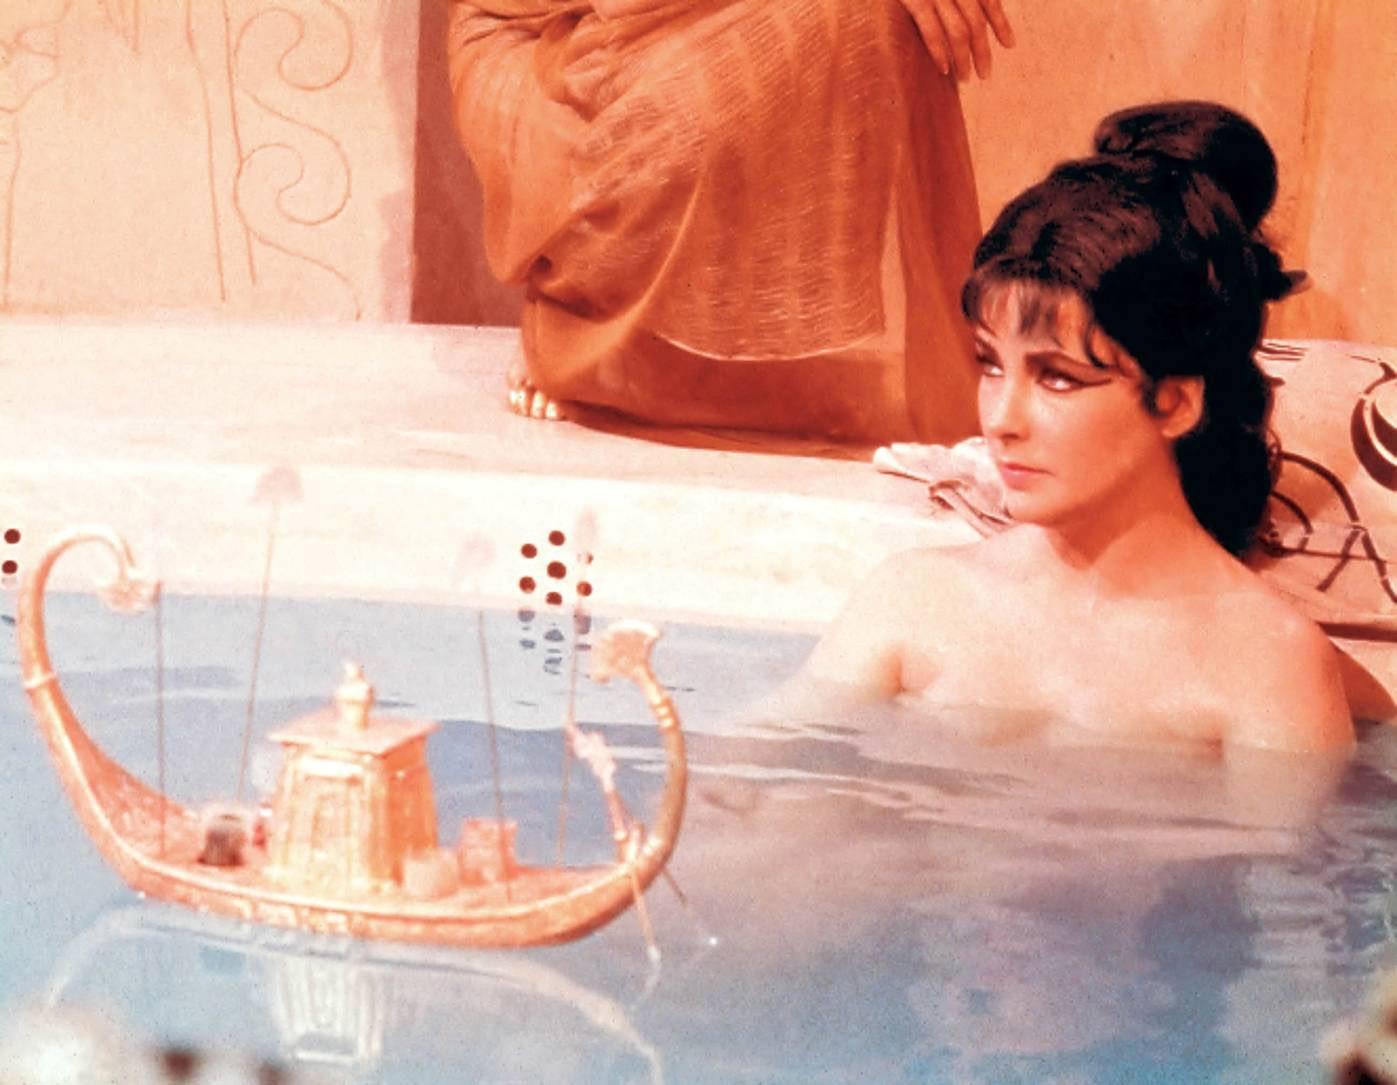 http://4.bp.blogspot.com/-wuHIk1hpCRU/UBgNycJPyrI/AAAAAAAAJvw/MOxbLnTywQI/s1600/Cleopatra-1963-elizabeth-taylor-16282319-1397-1085.jpg